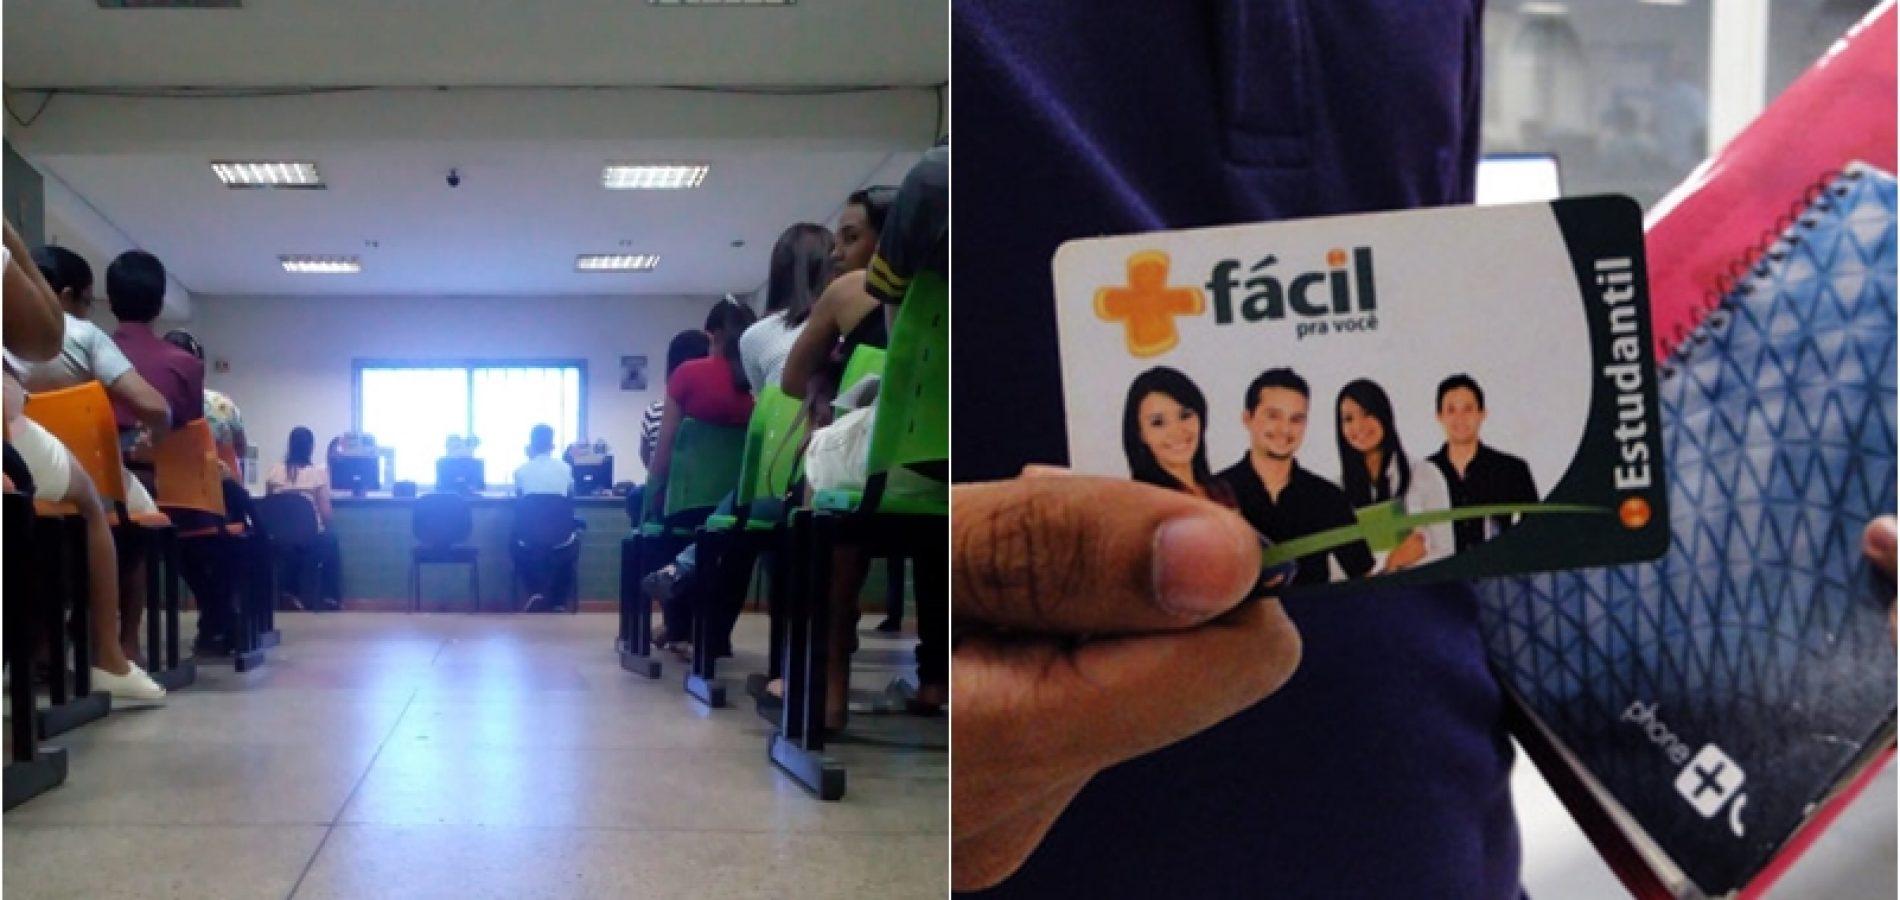 Setut é denunciado por cobrar R$ 1 por xerox para desbloquear passe